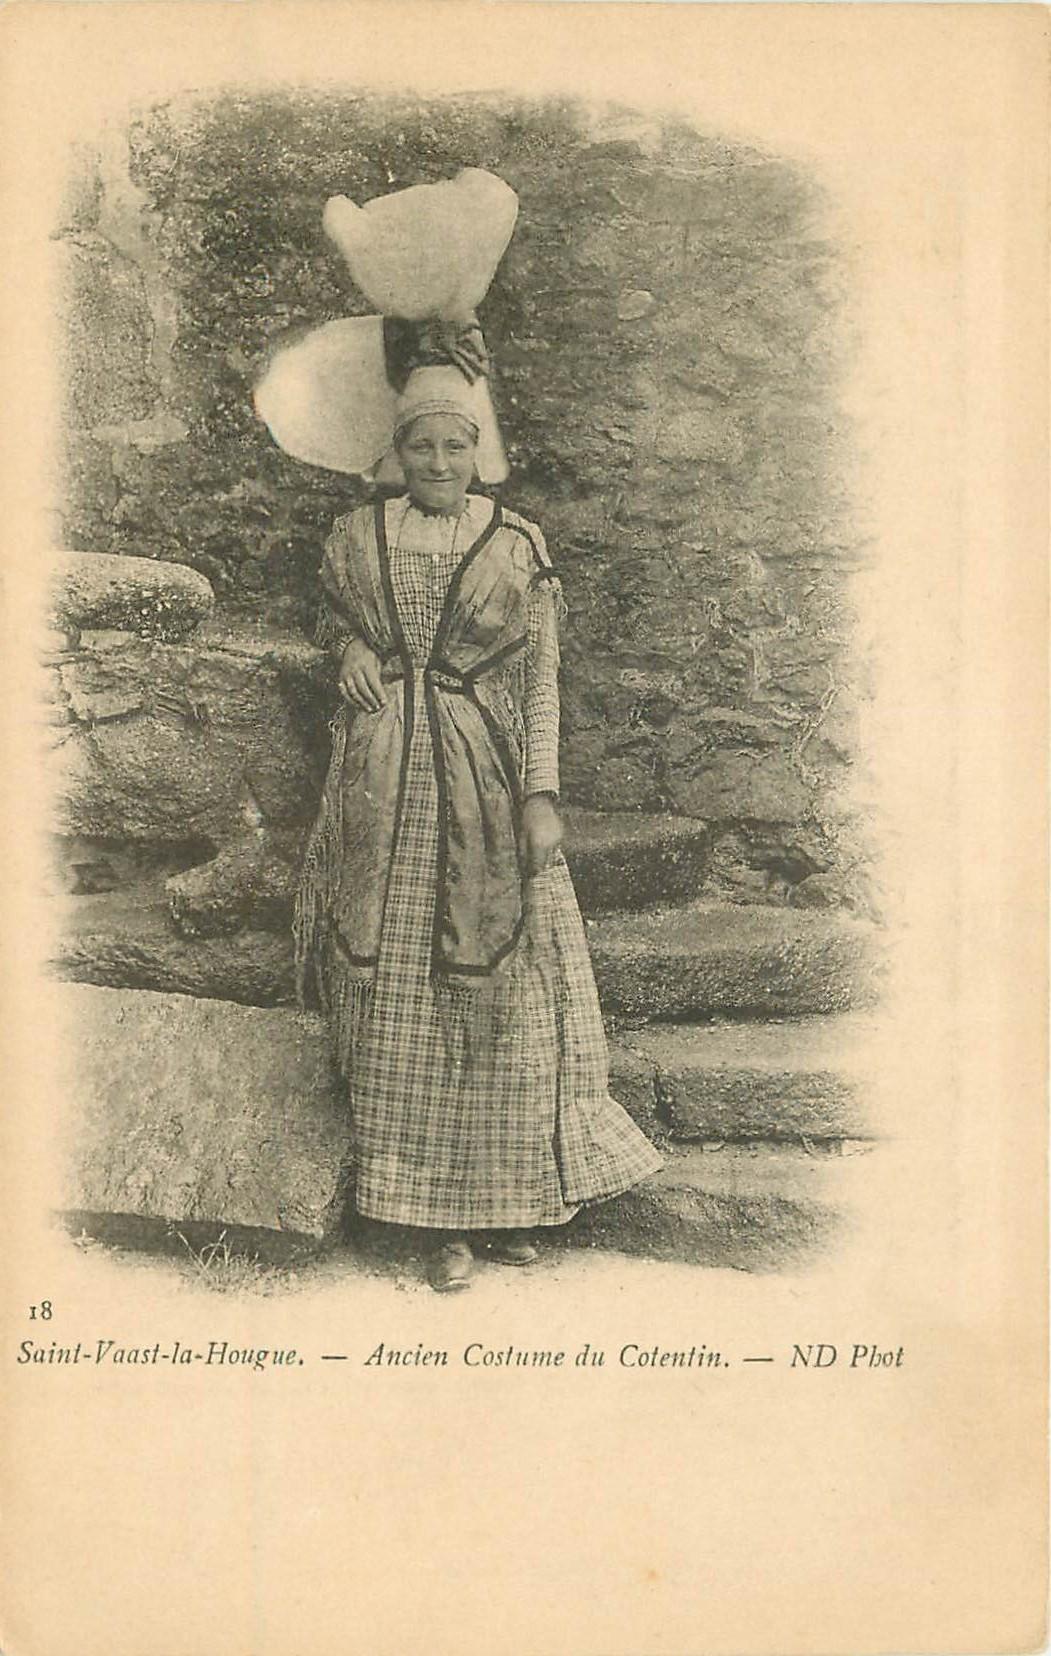 50 SAINT-VAAST-LA-HOUGUE. Ancien Costume du Cotentin